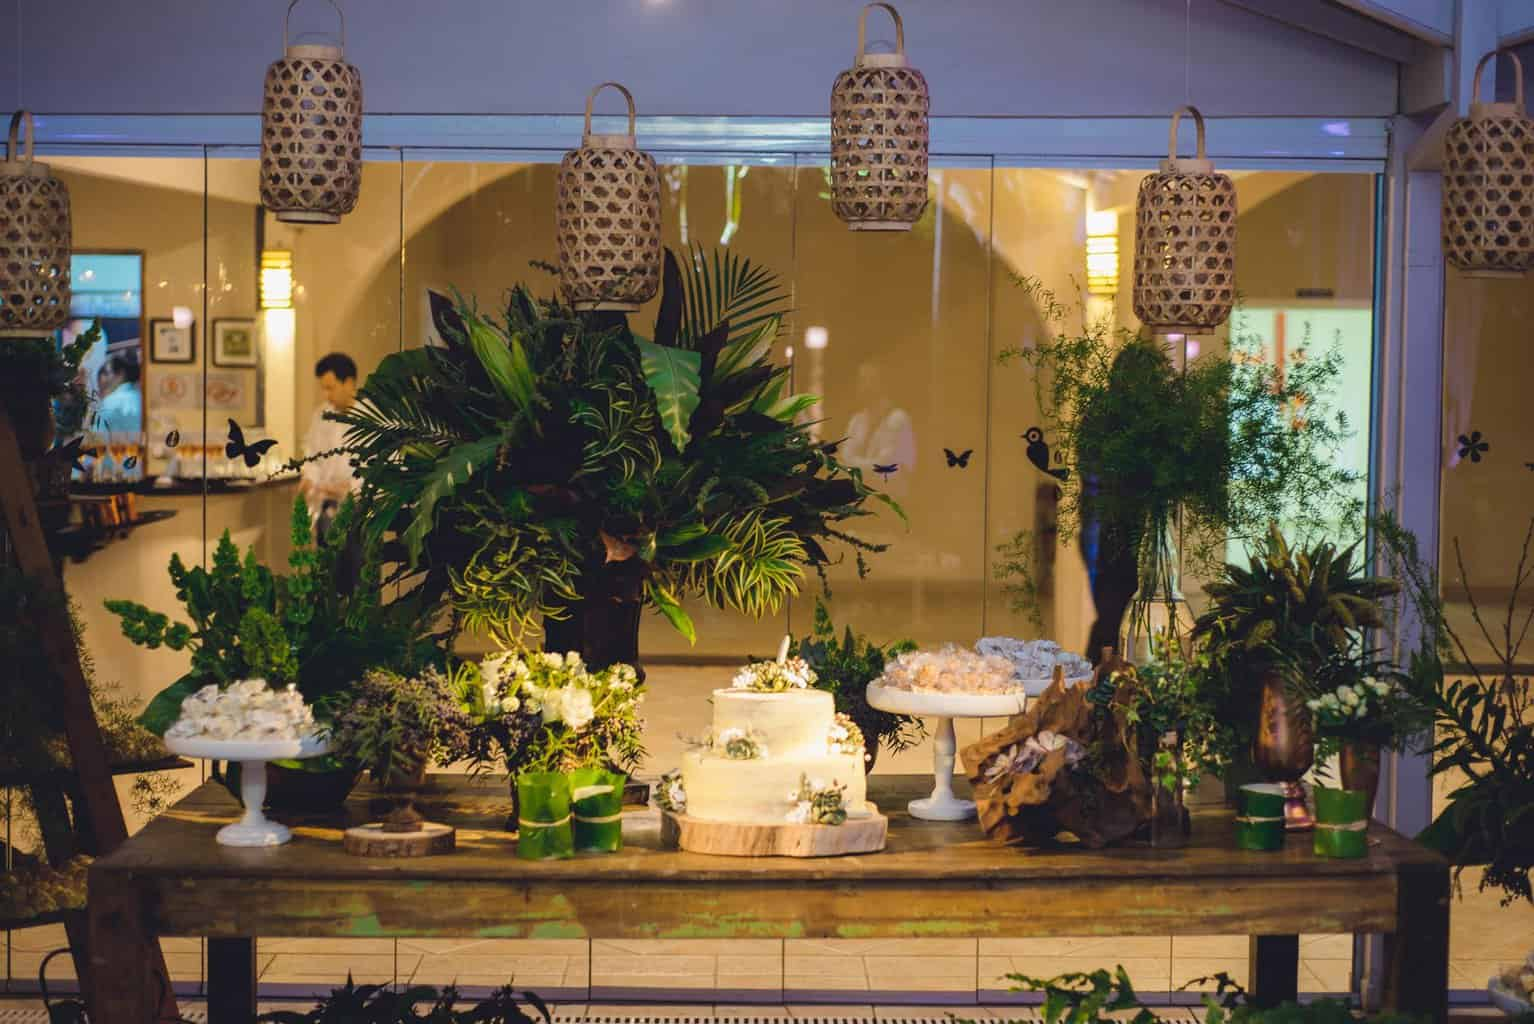 Casamento_Edt2_Muvone_11-12Ago18_BeachHotel_Maresias_Takayama-153